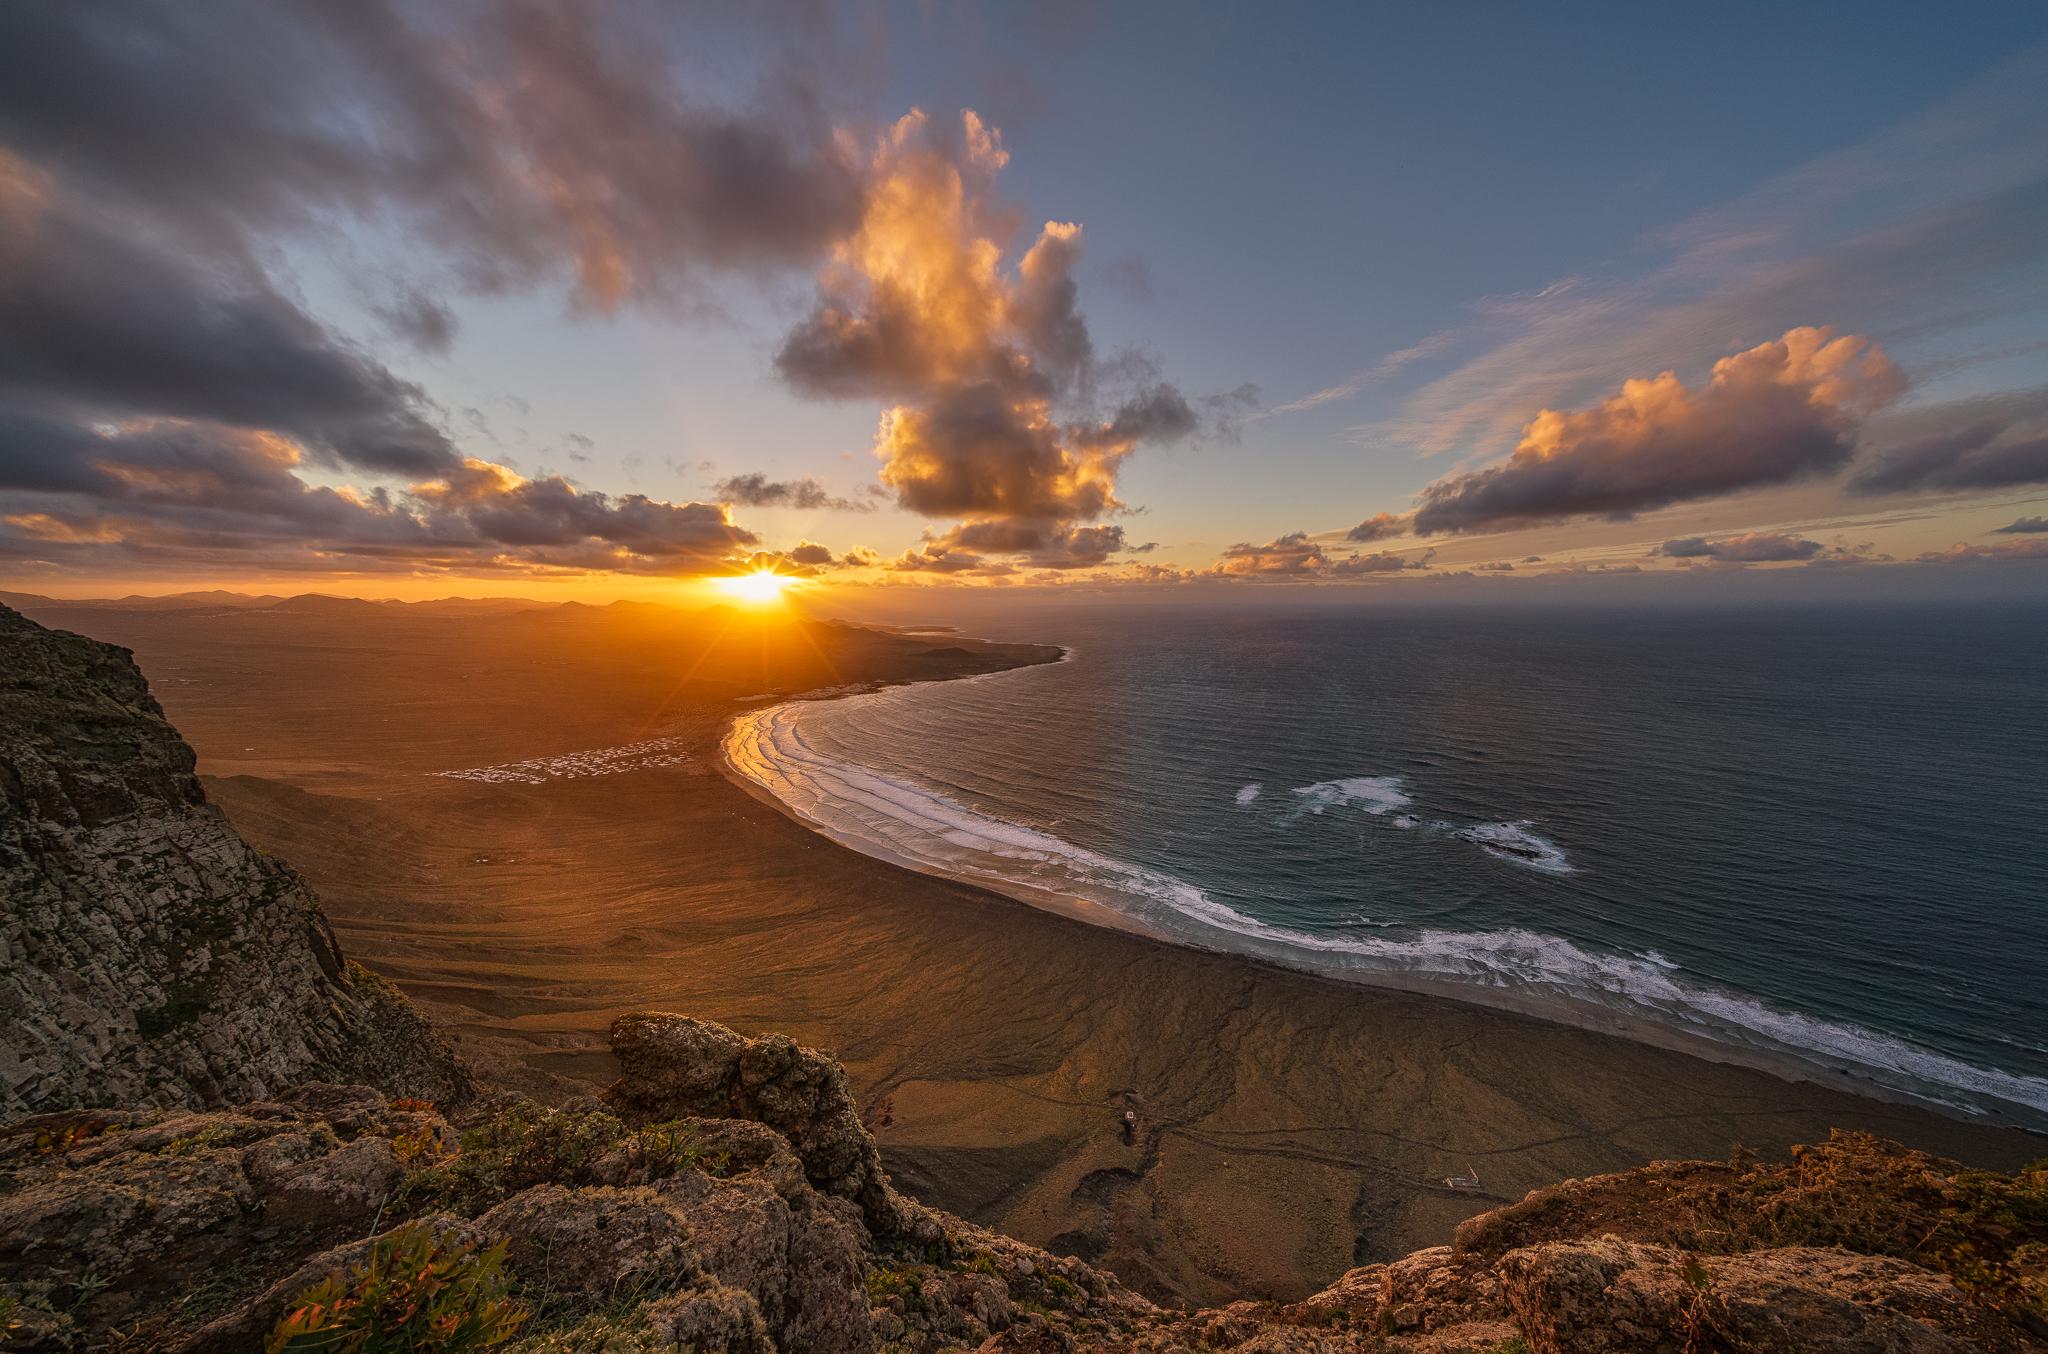 Famara Cliff, Spain